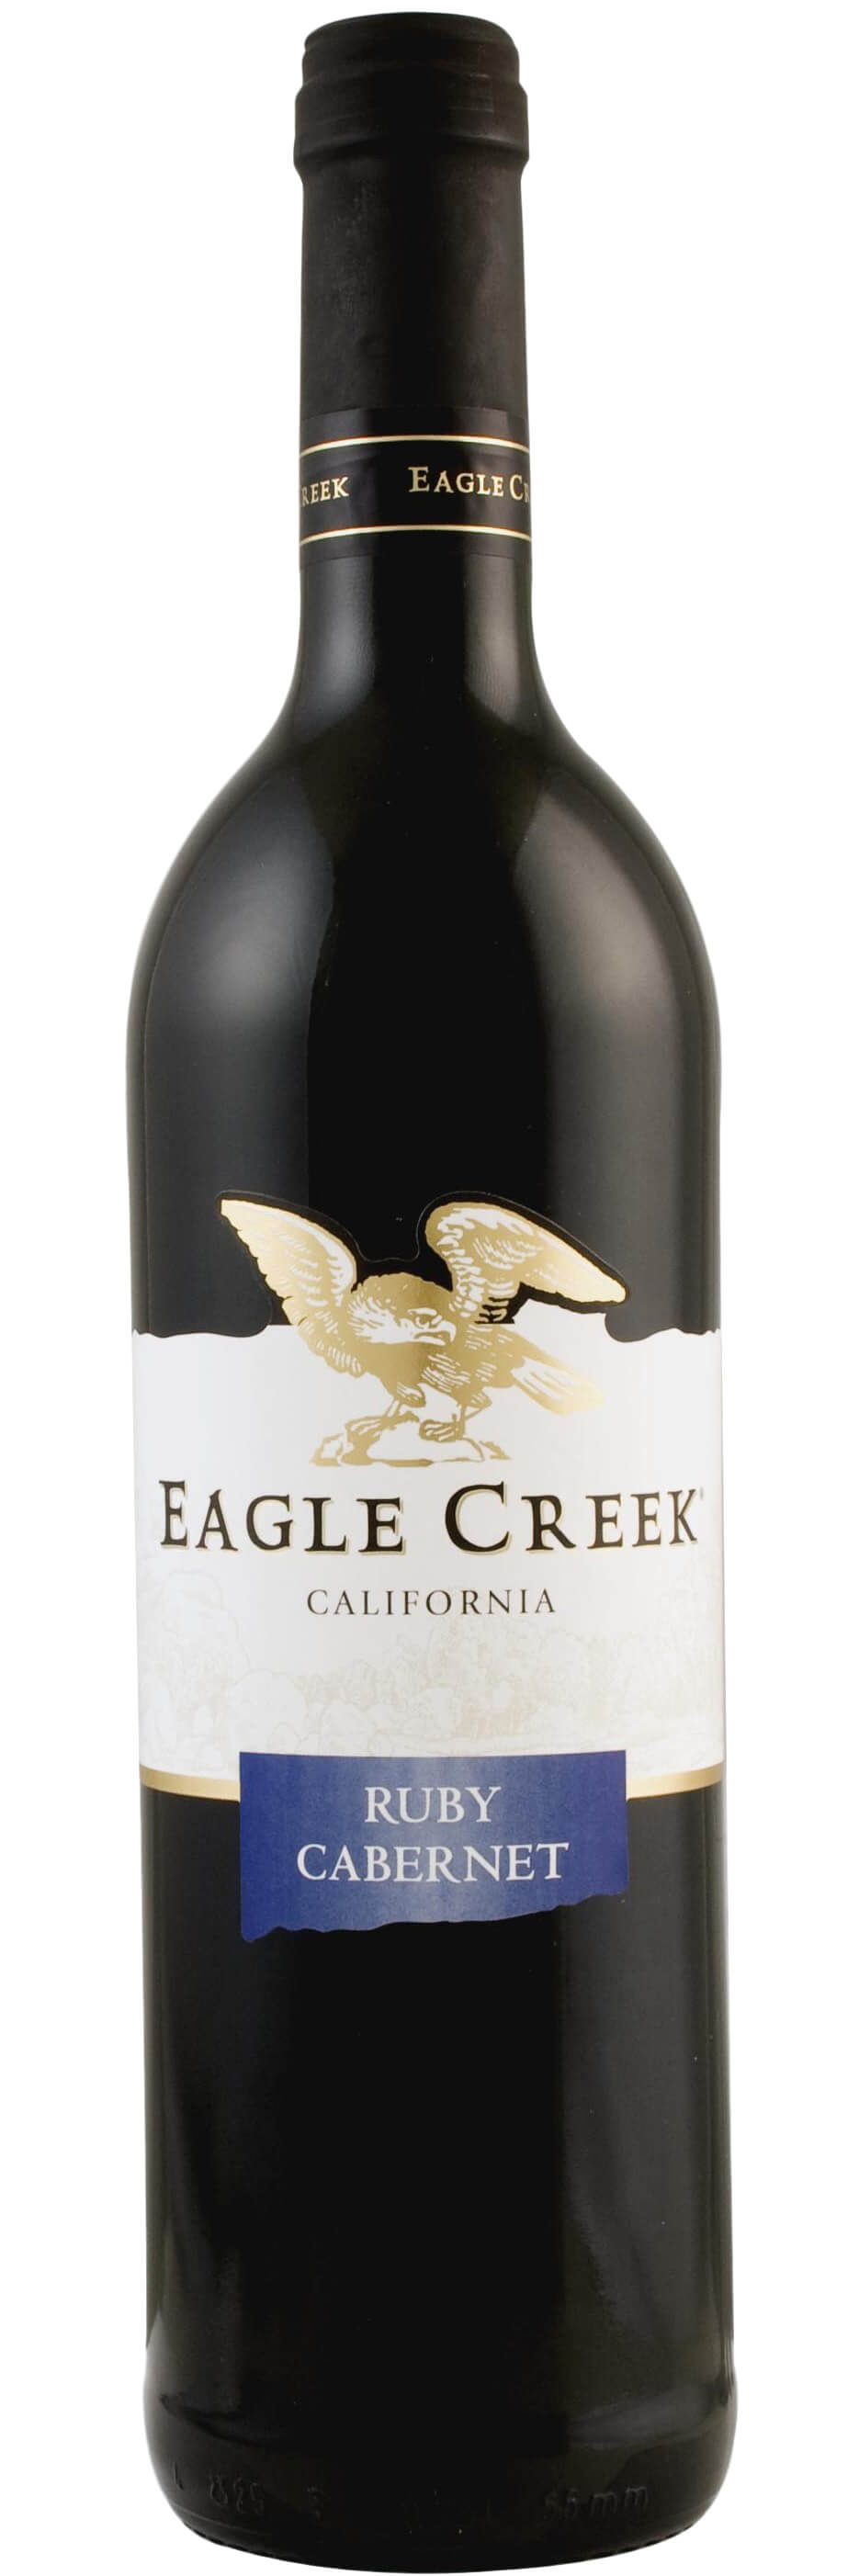 Eagle Creek Ruby Cabernet фото